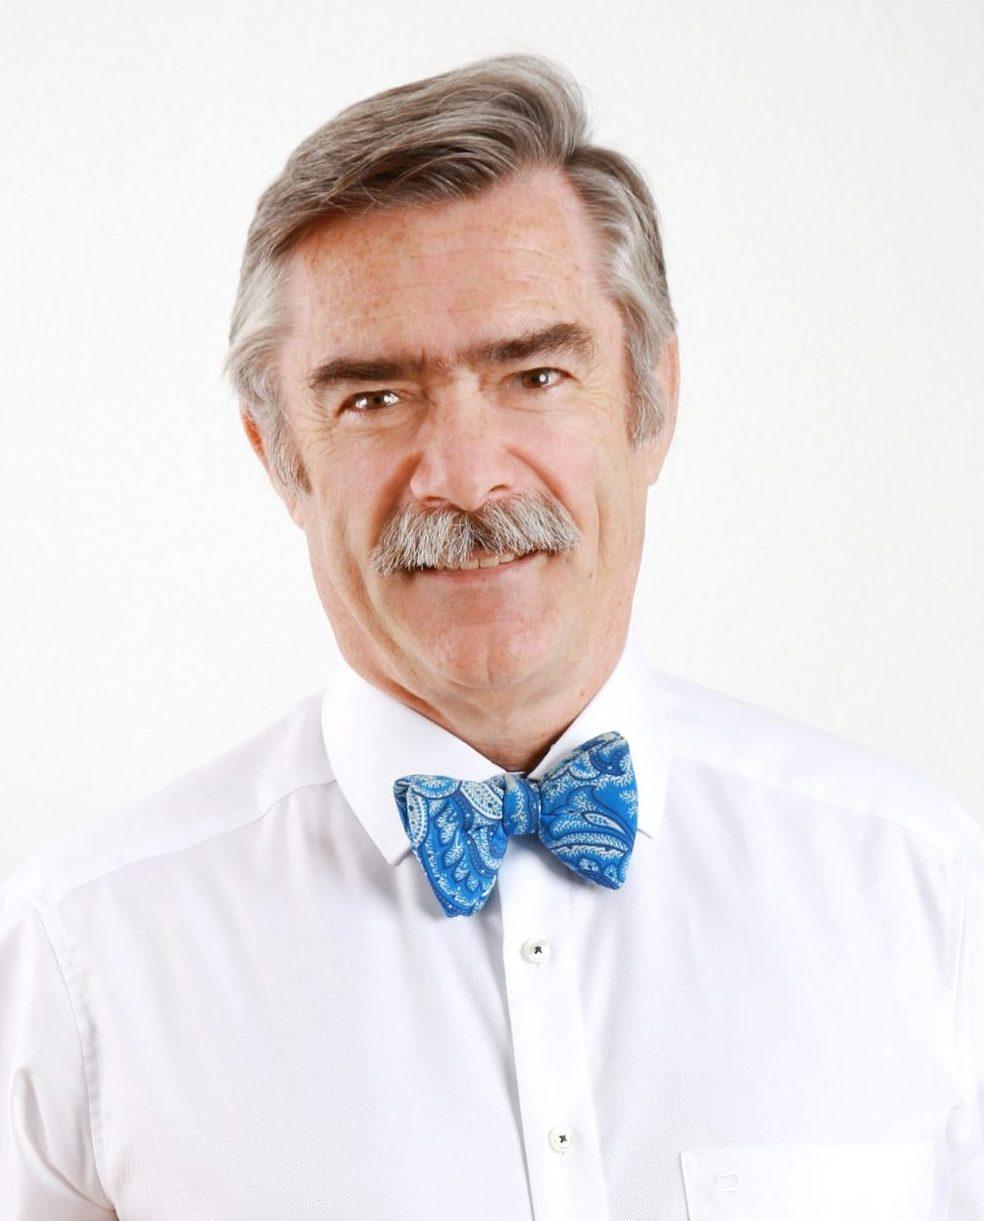 Augenarzt Dr. Dr. med. habil. Ekkehard Fabian - Augencentrum Rosenheim